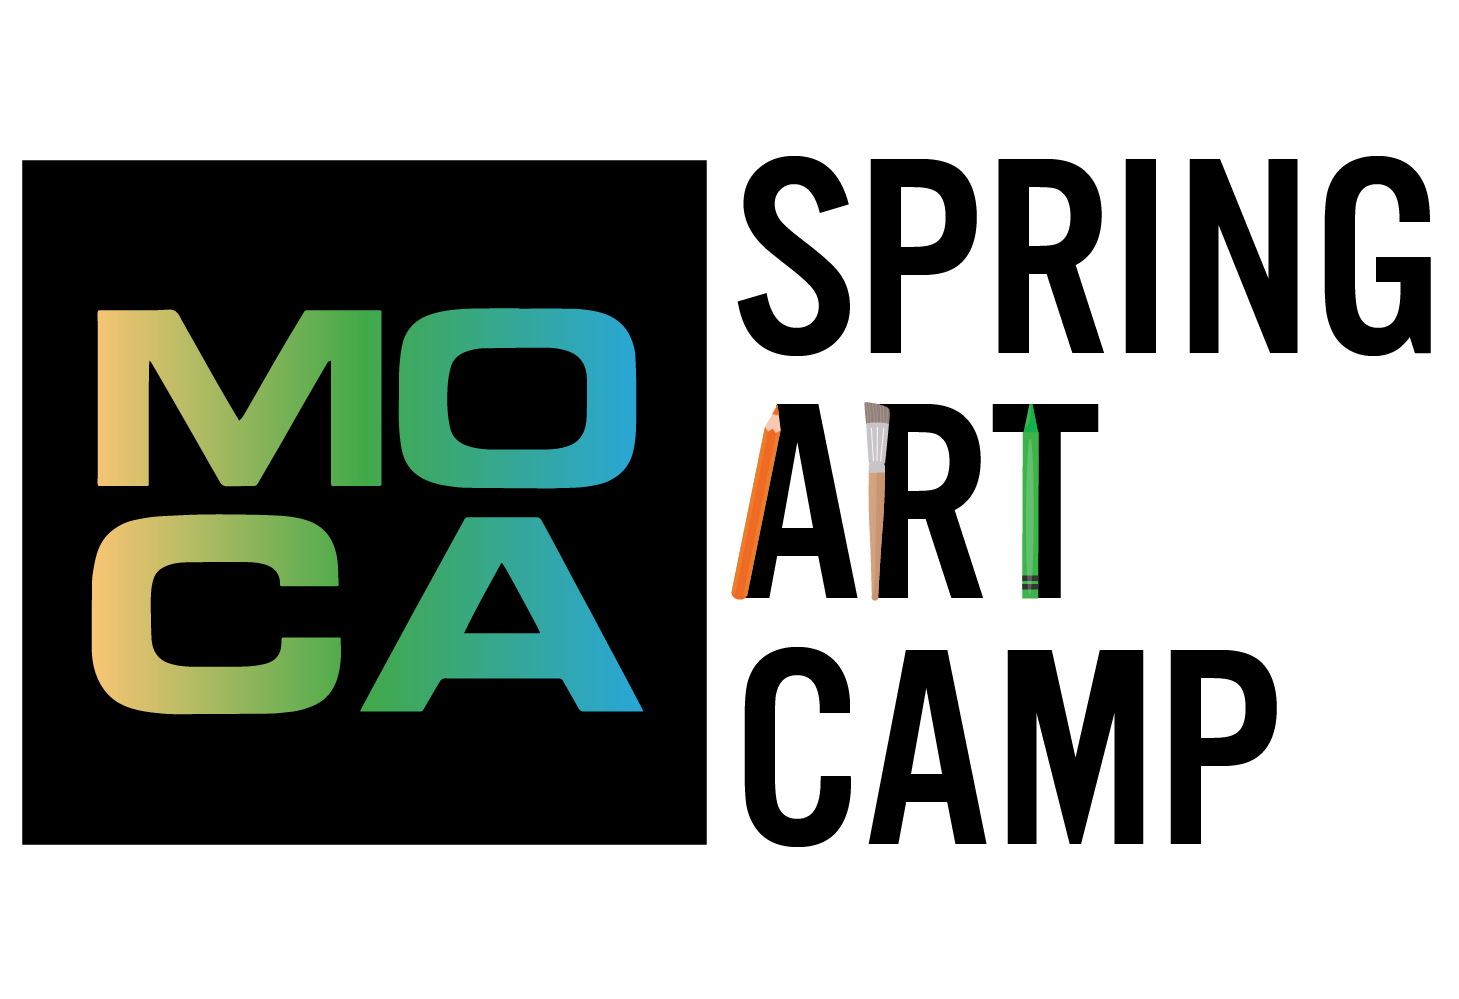 Spring art camp 2020